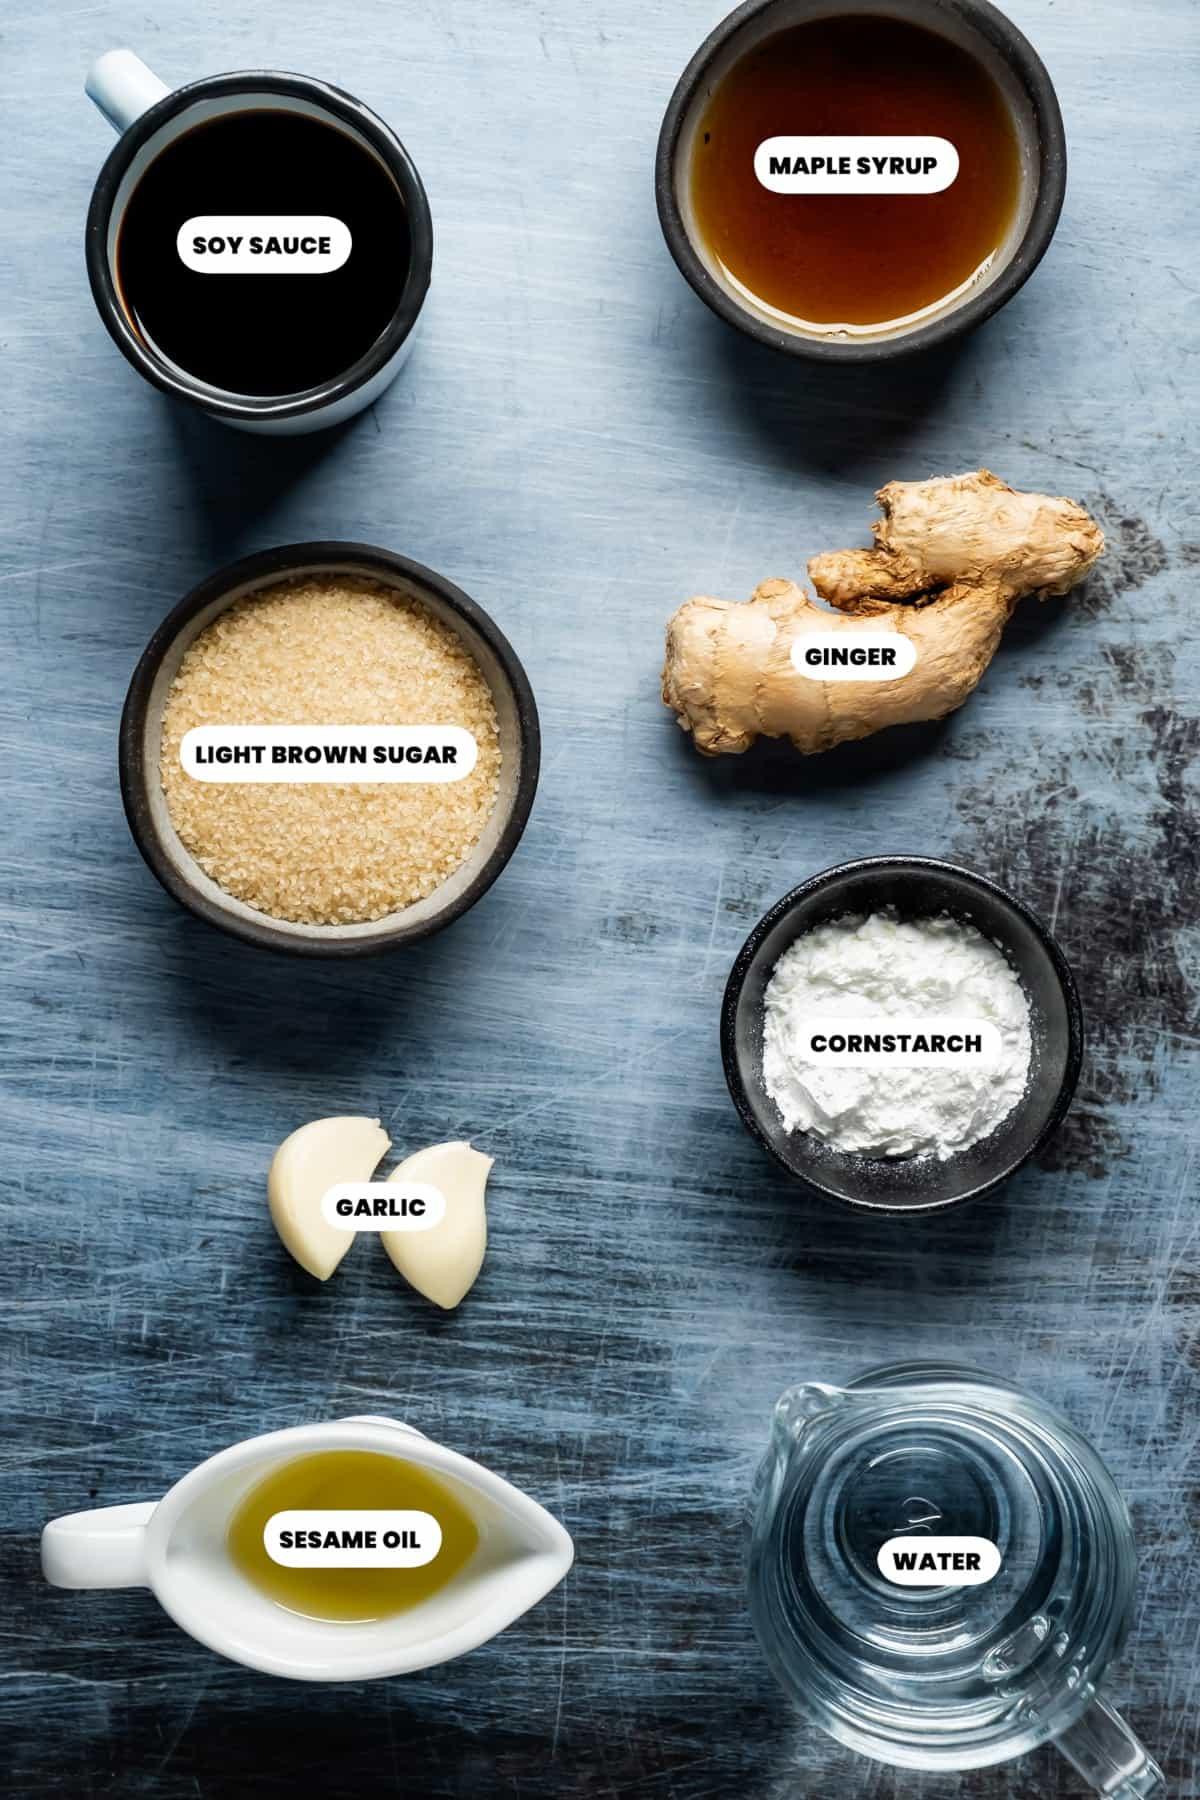 Photo of the ingredients needed to make vegan teriyaki sauce.